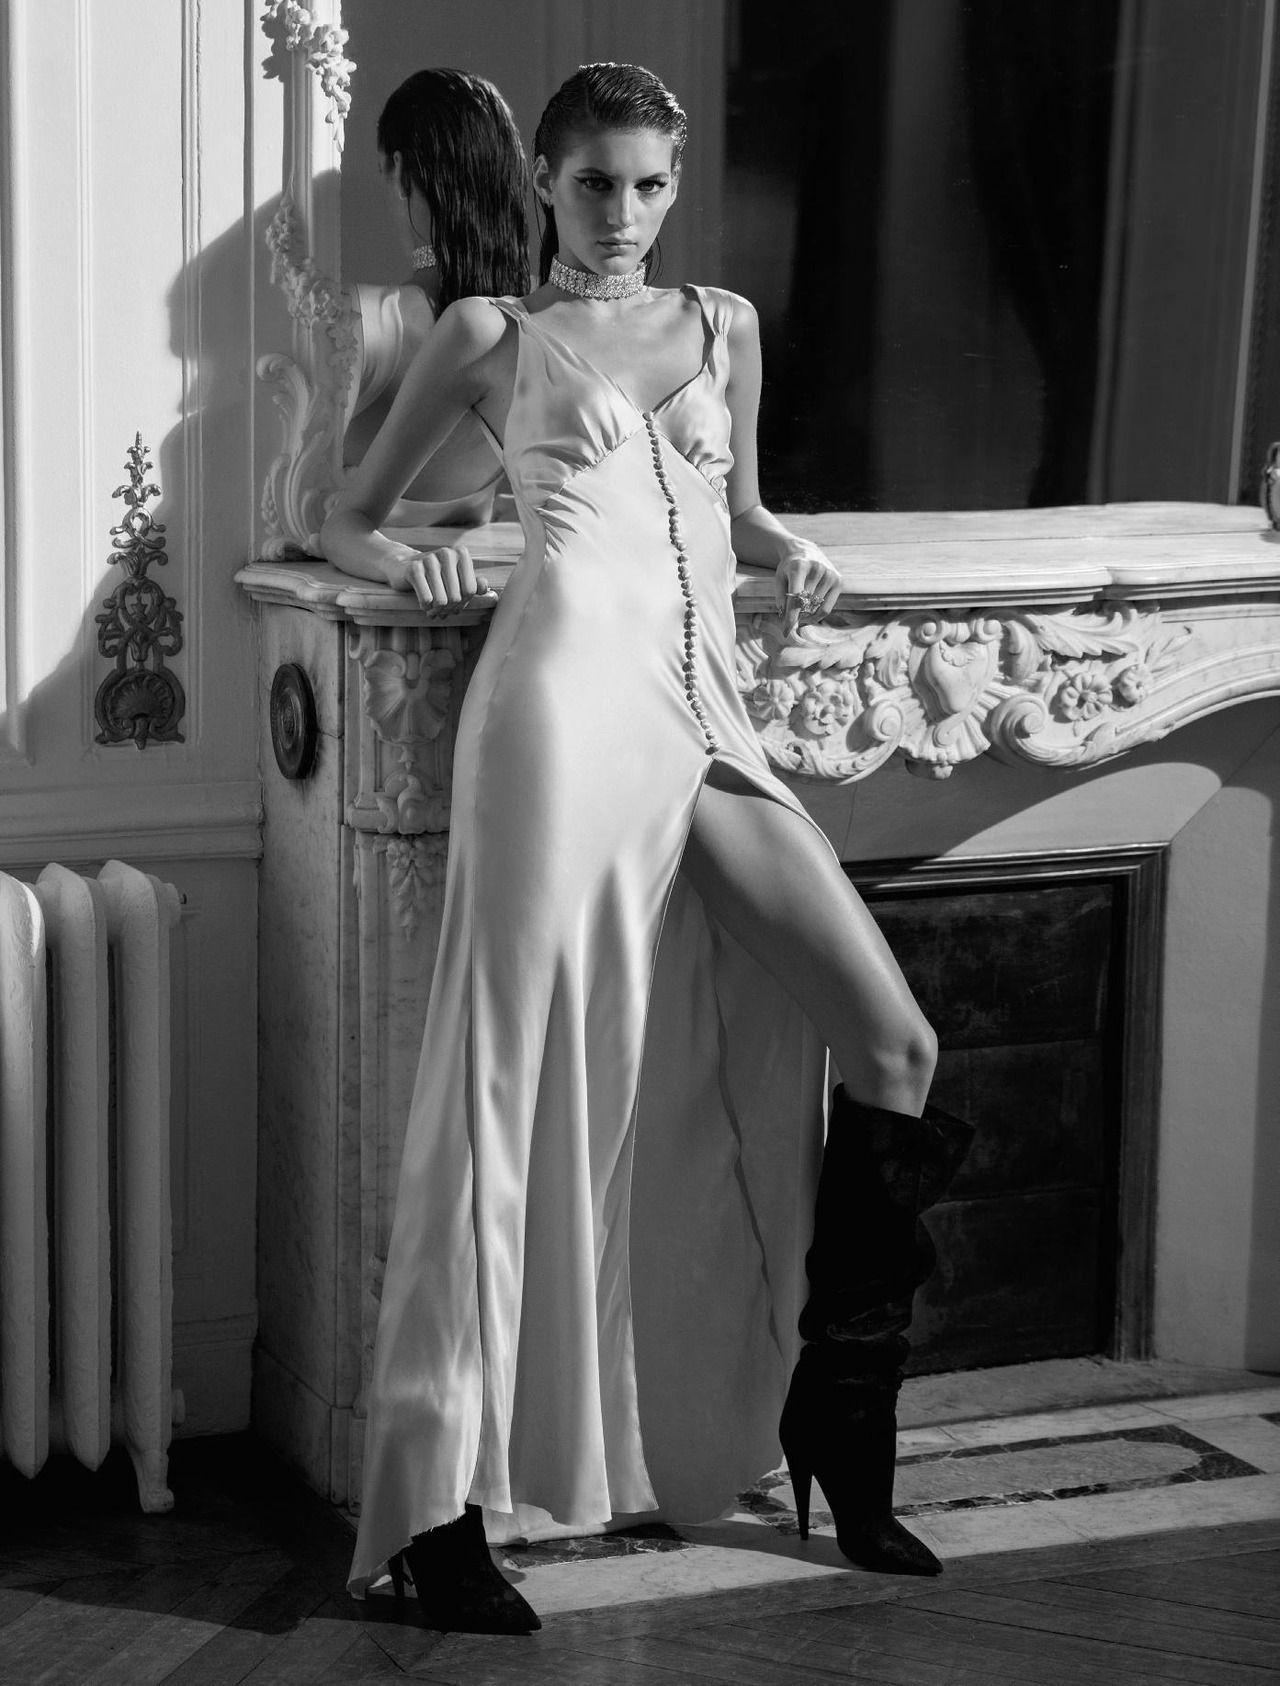 cleavage Hacked Sofia Chuprikova naked photo 2017